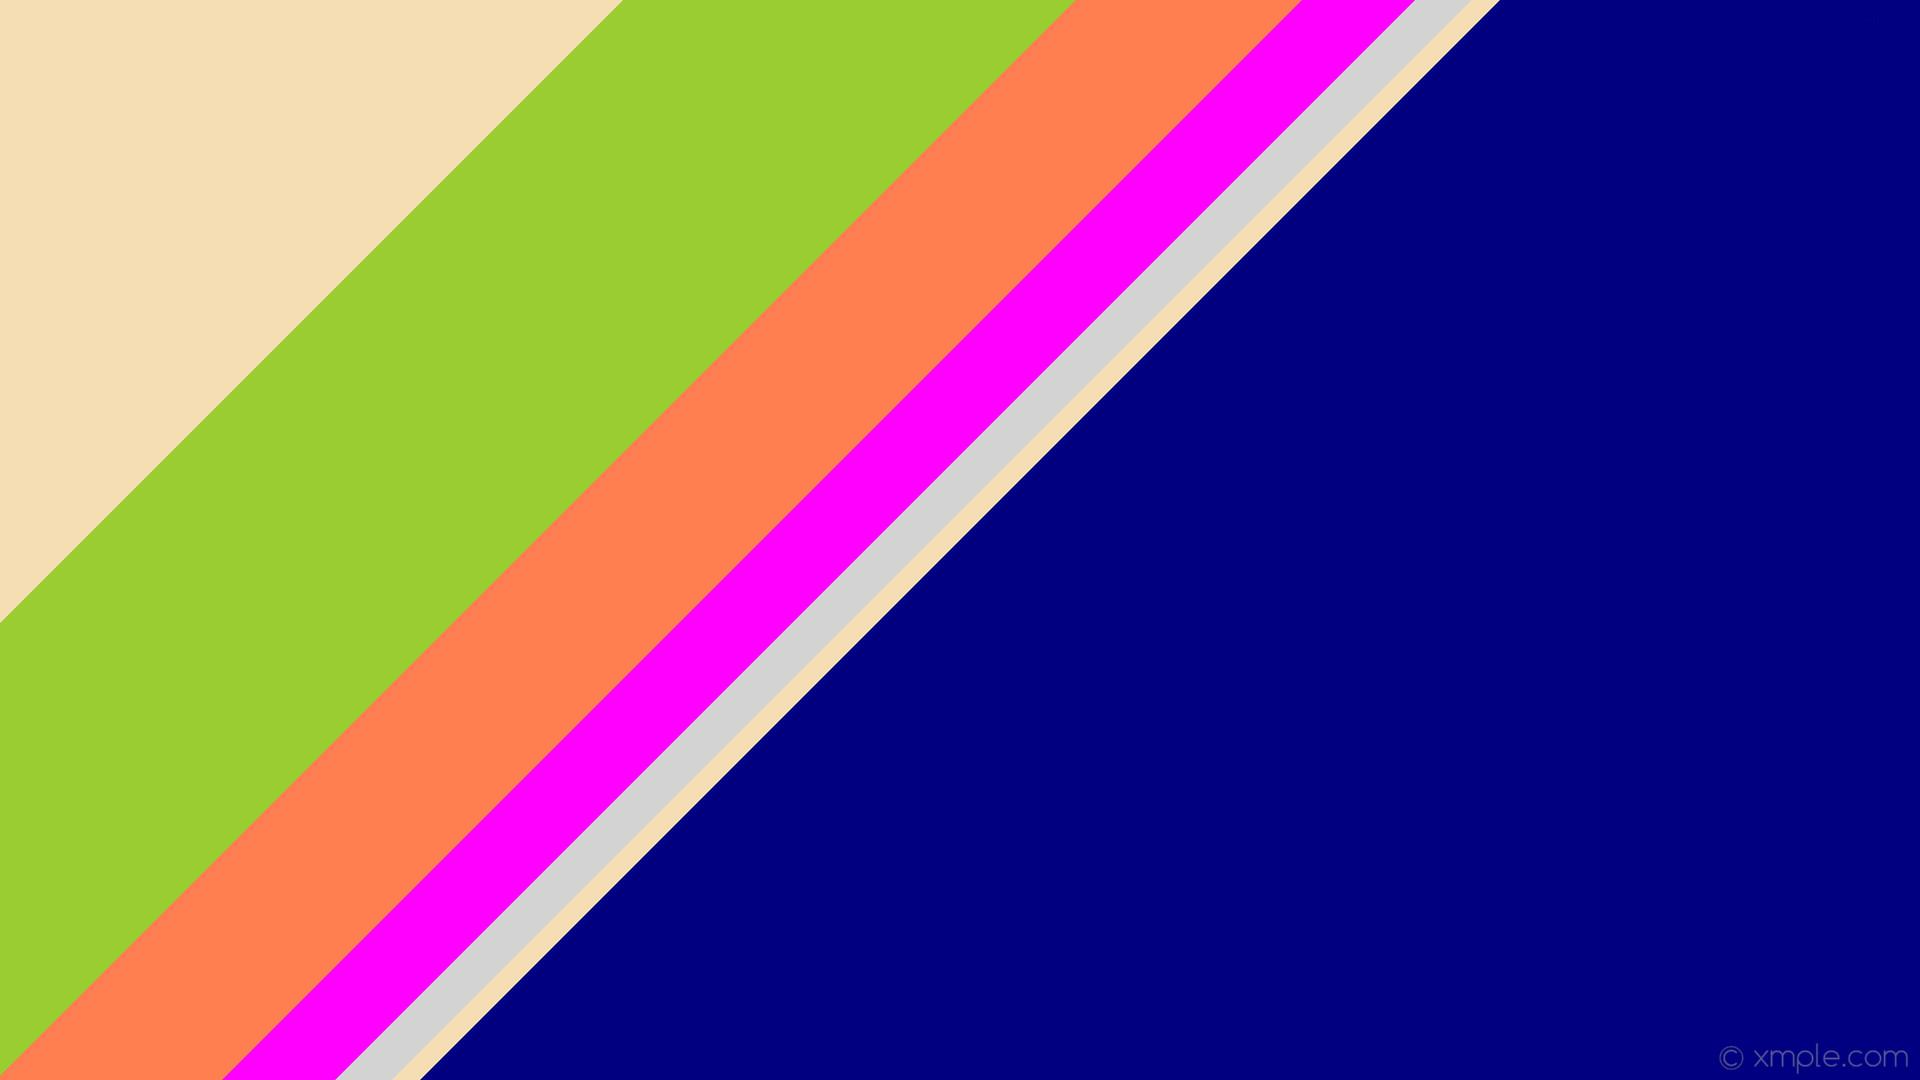 wallpaper blue grey green stripes purple lines streaks brown orange wheat  light gray magenta coral yellow